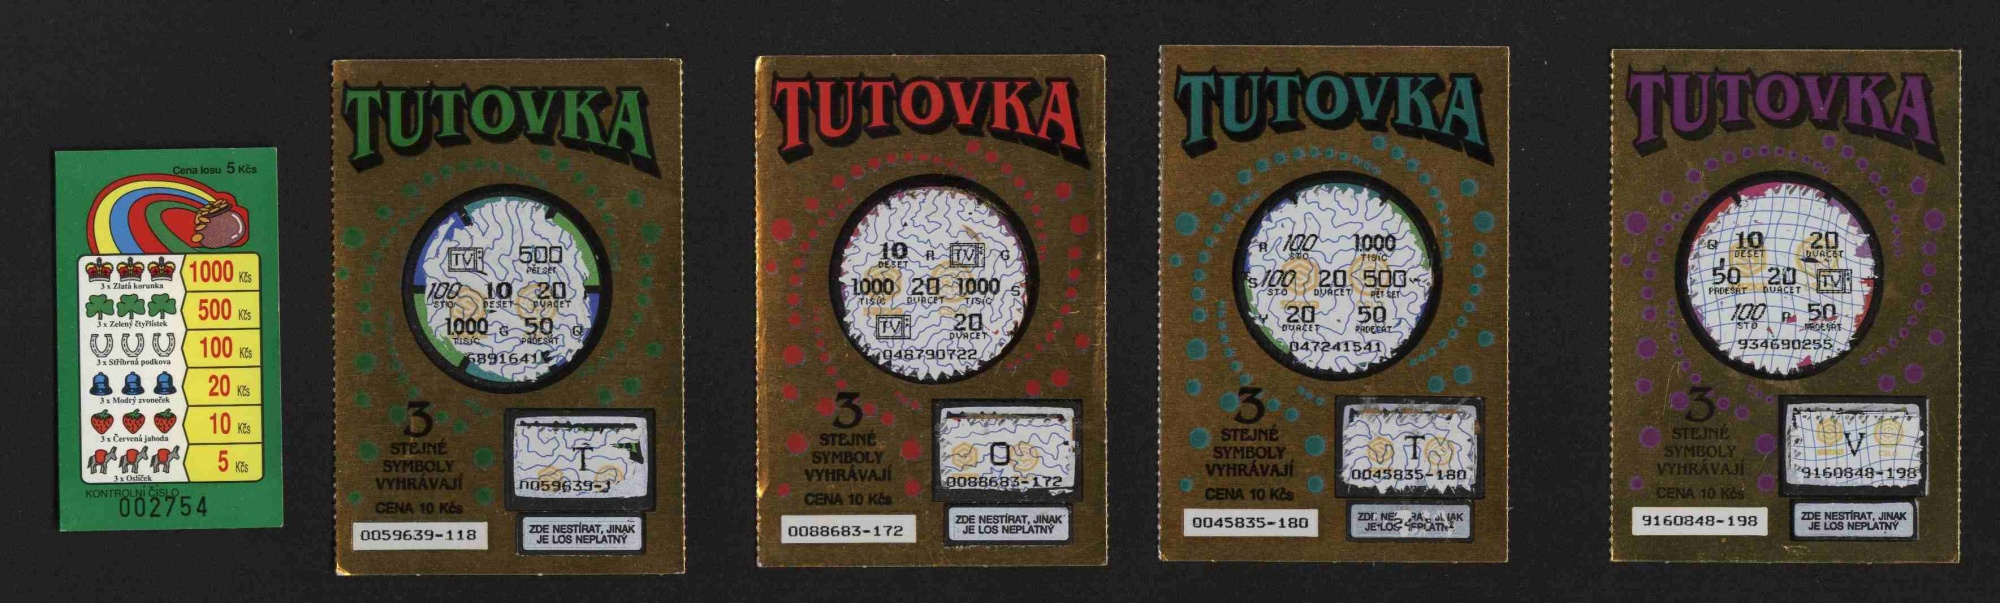 051_tutovka-los_h8j__171122-174035_miz.jpg